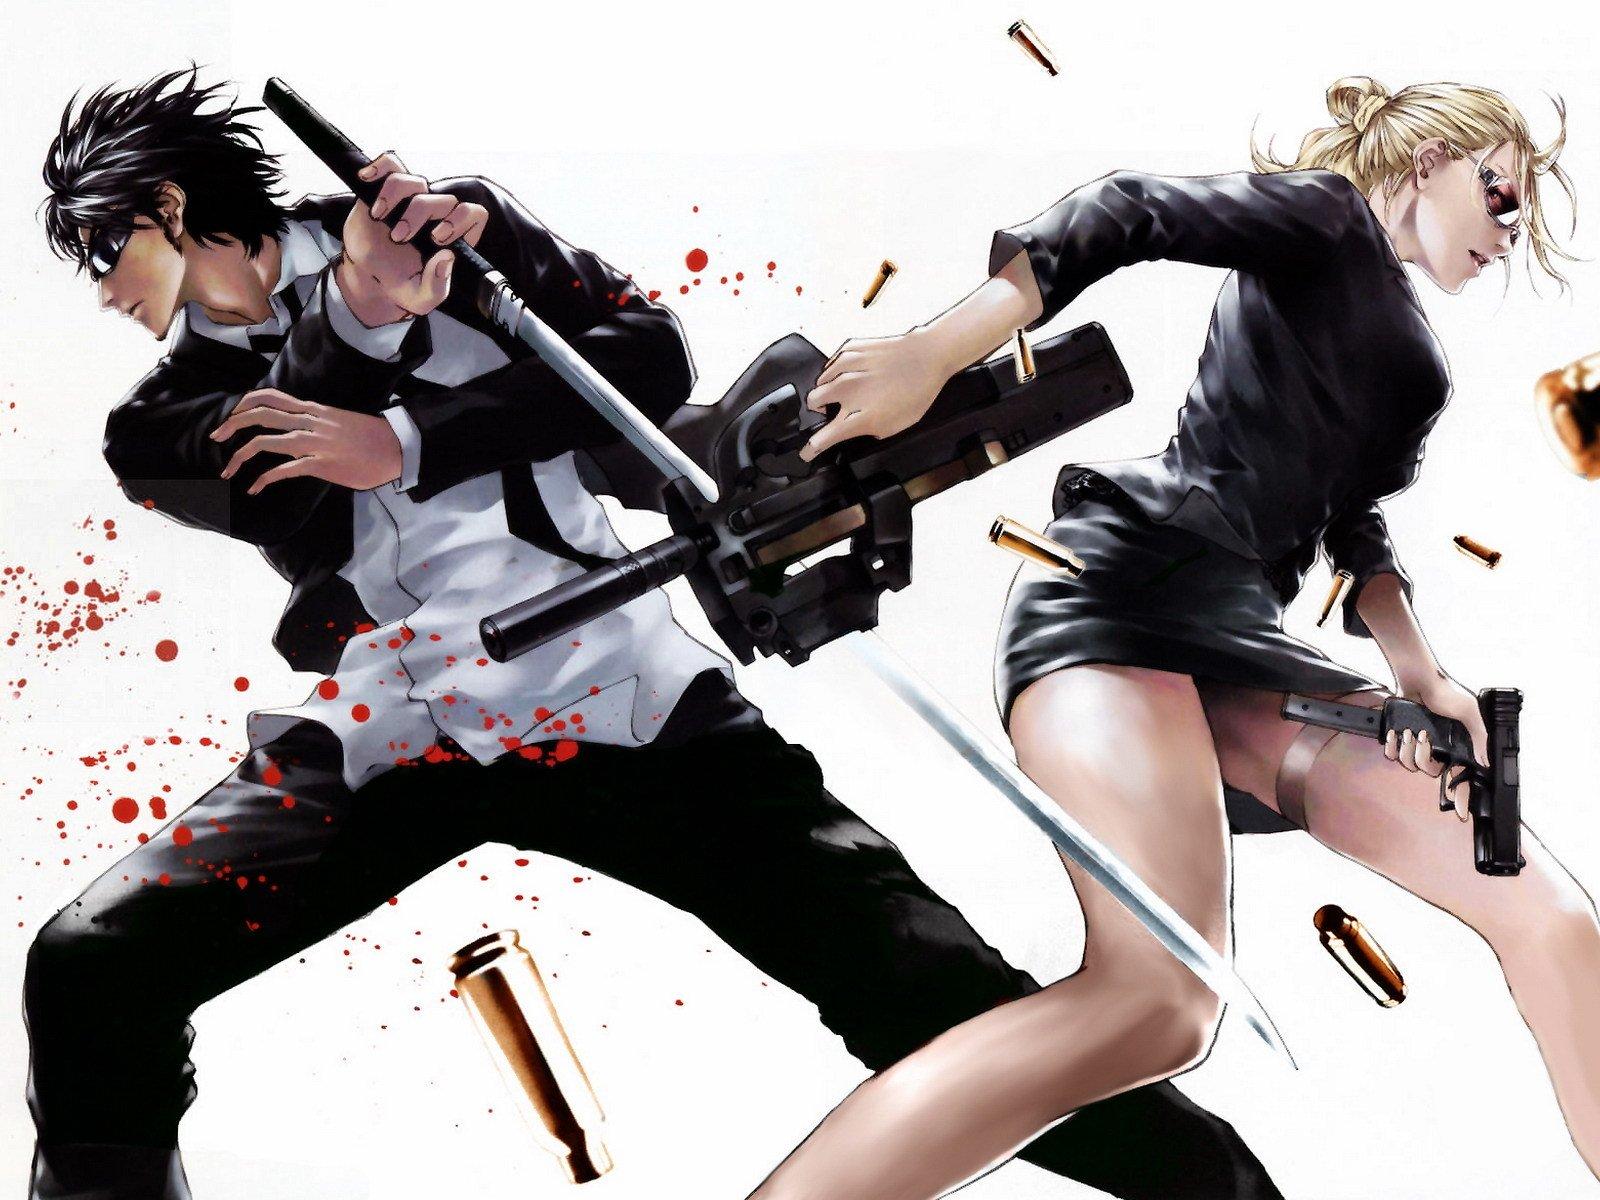 men women guns anime blood katana wallpaper | 1600x1200 | 488990